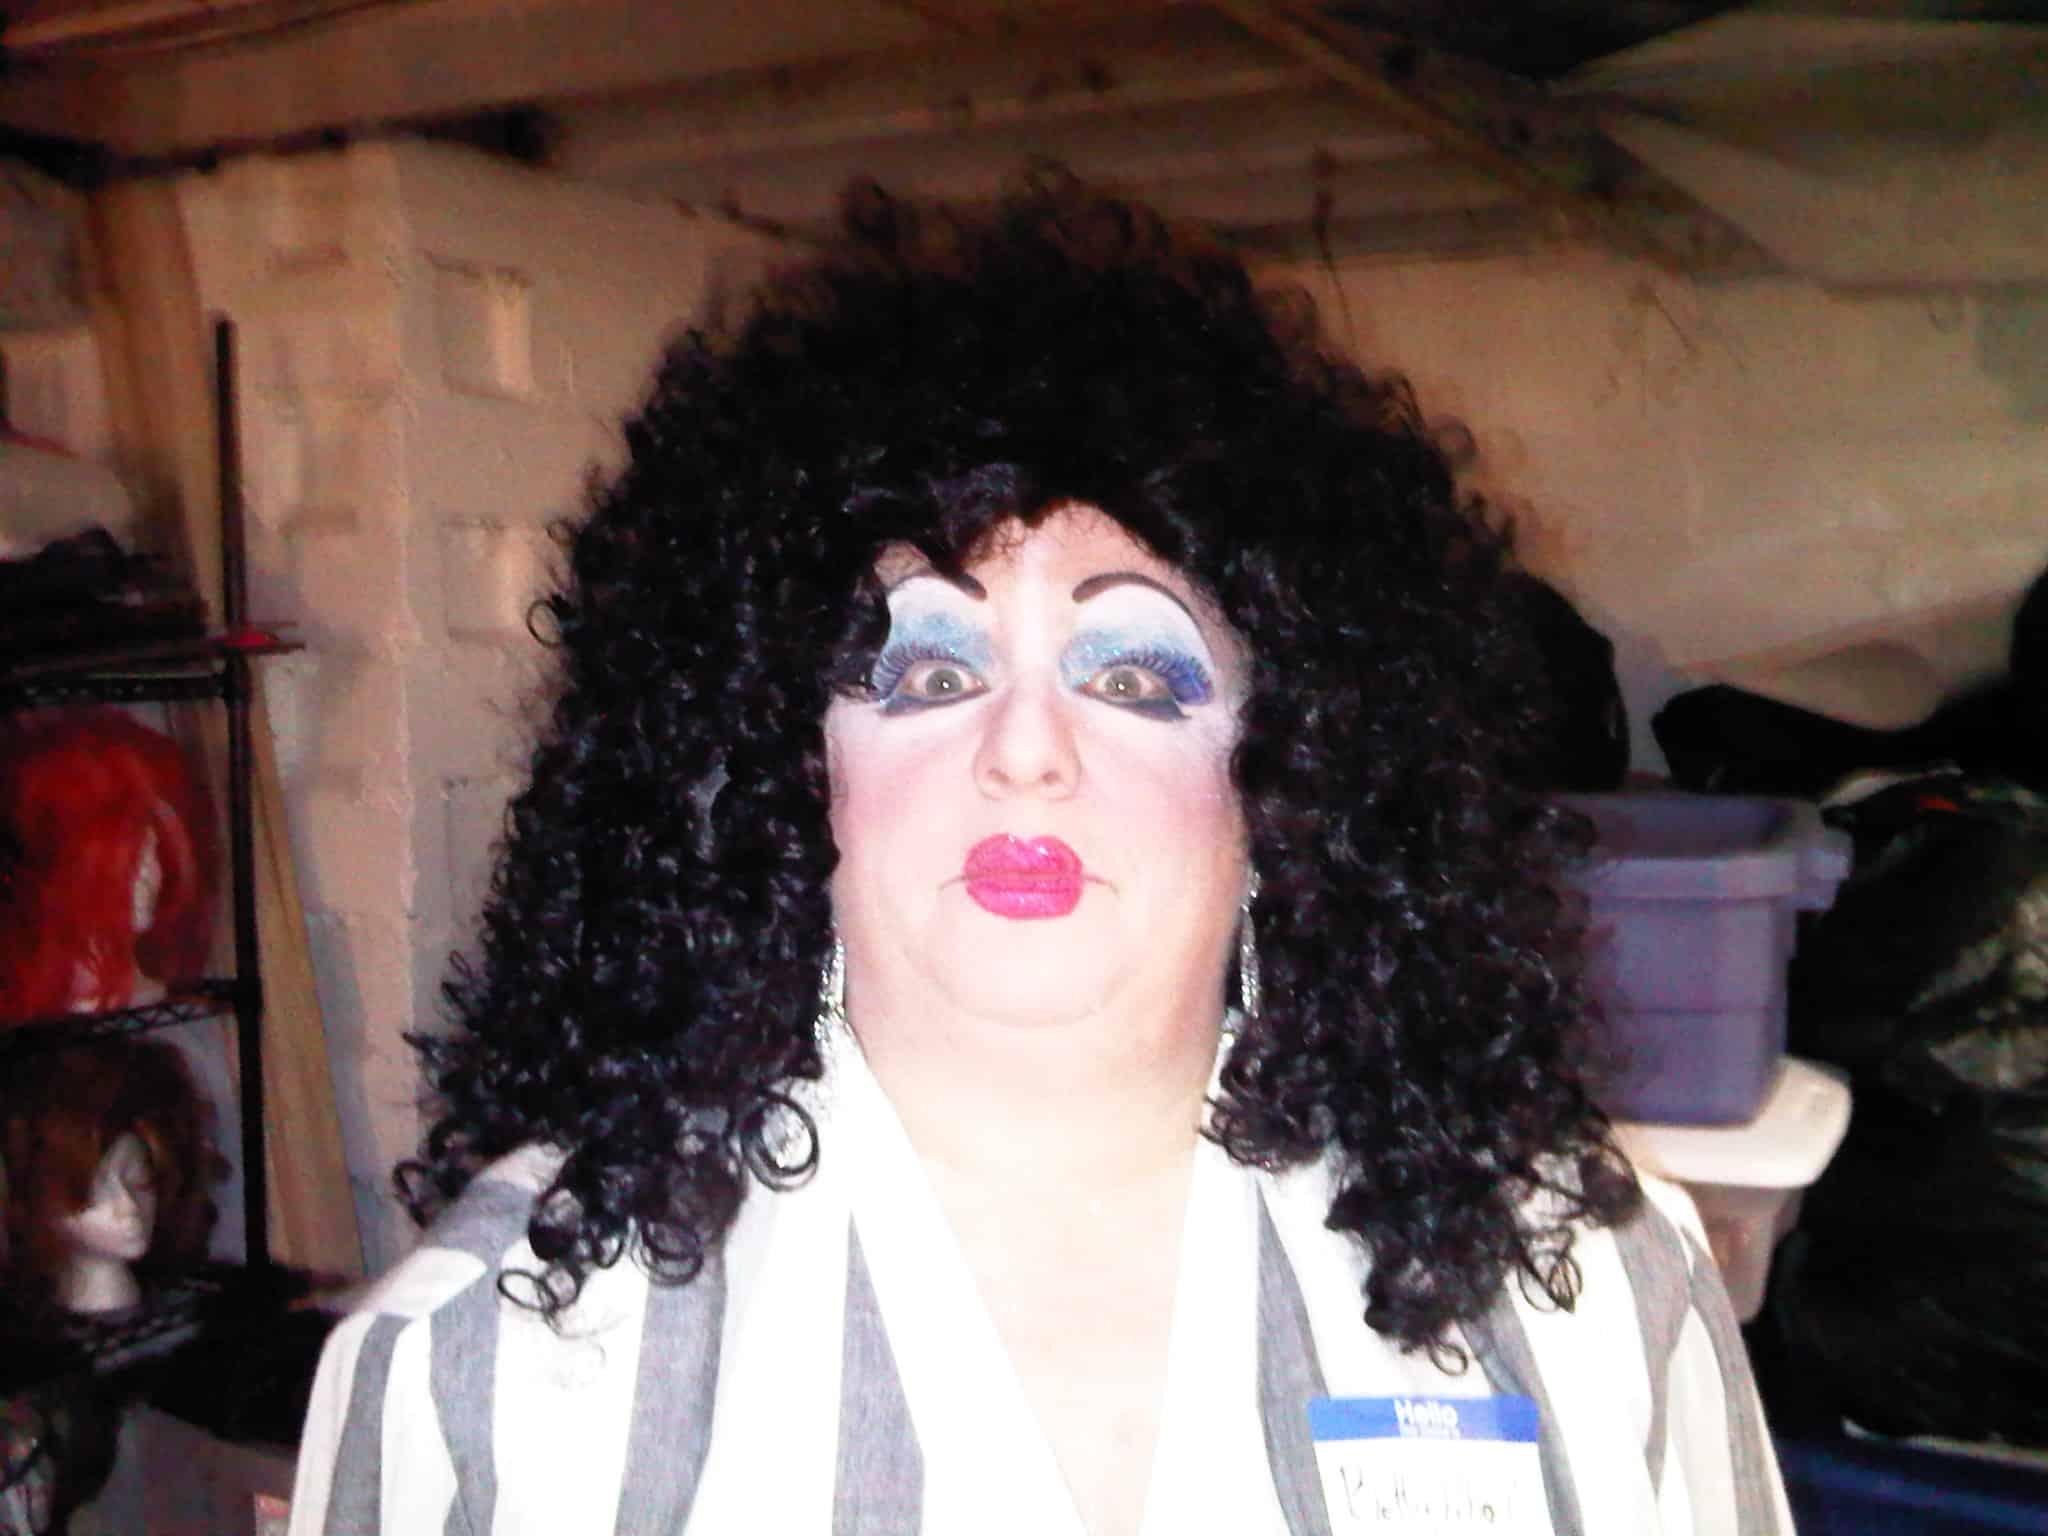 Nancy at Halloween